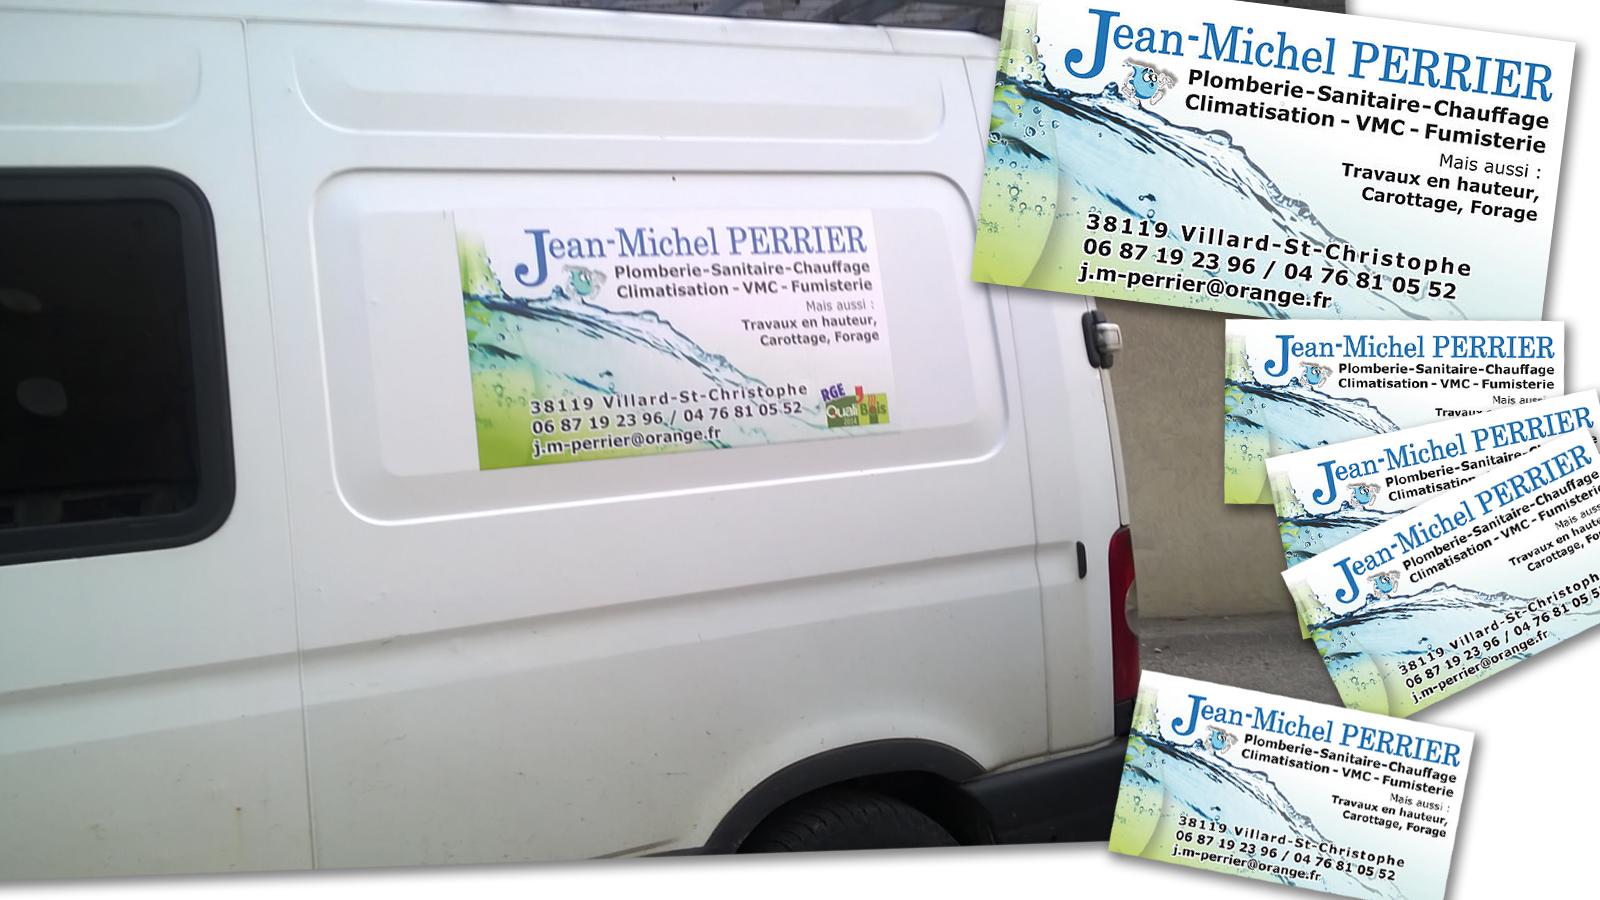 Jean Michel PERRIER